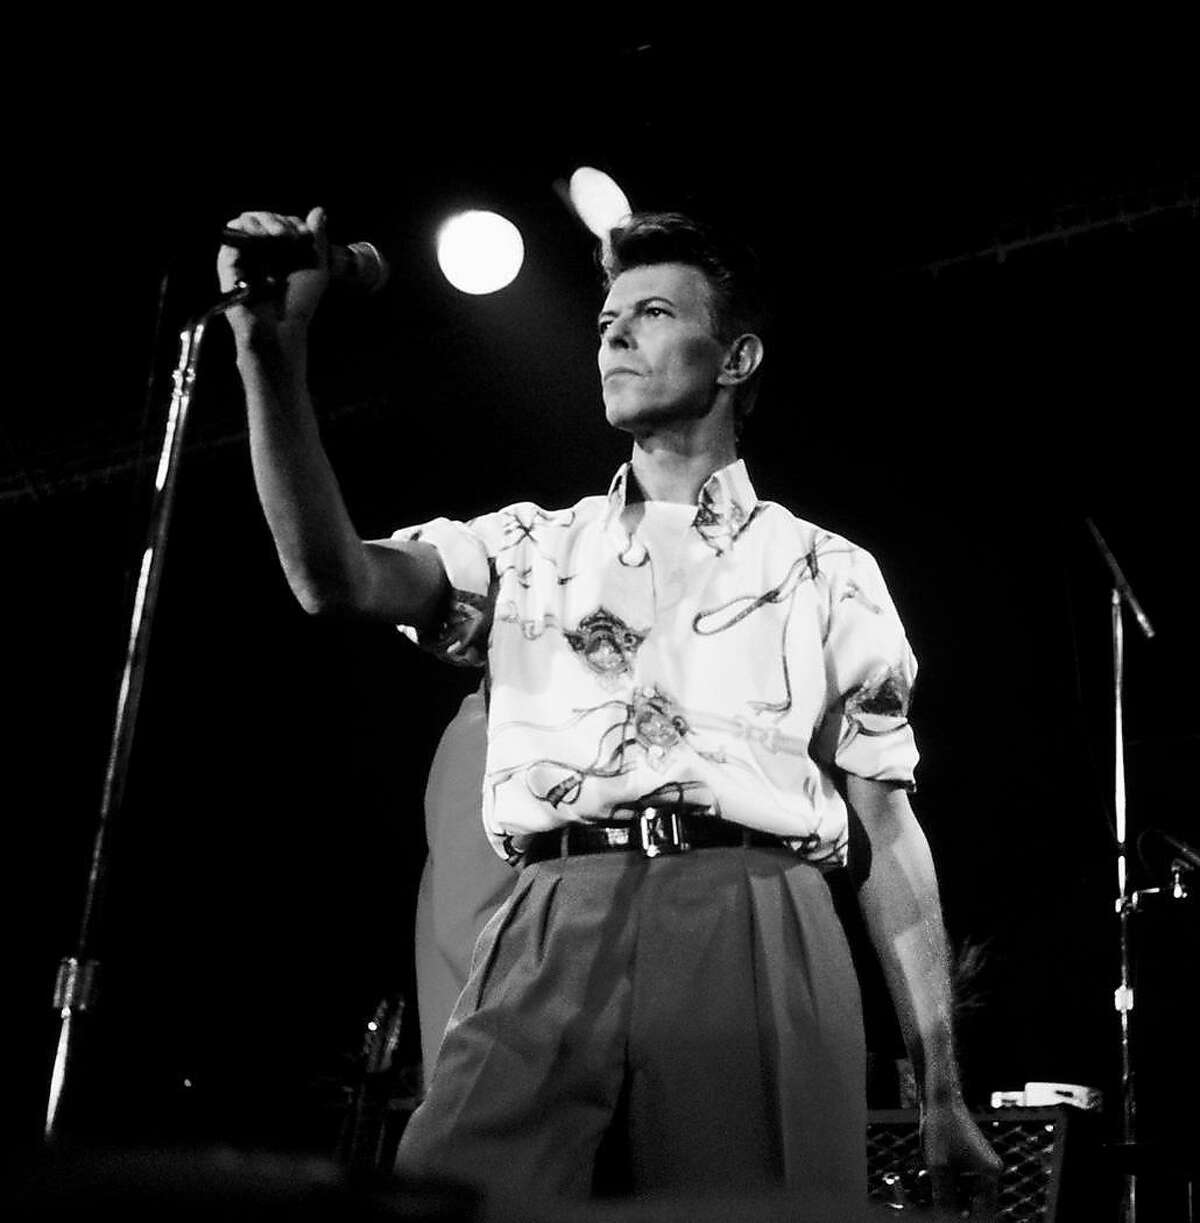 Slim's 20th anniversary. David Bowie September 12, 1991.